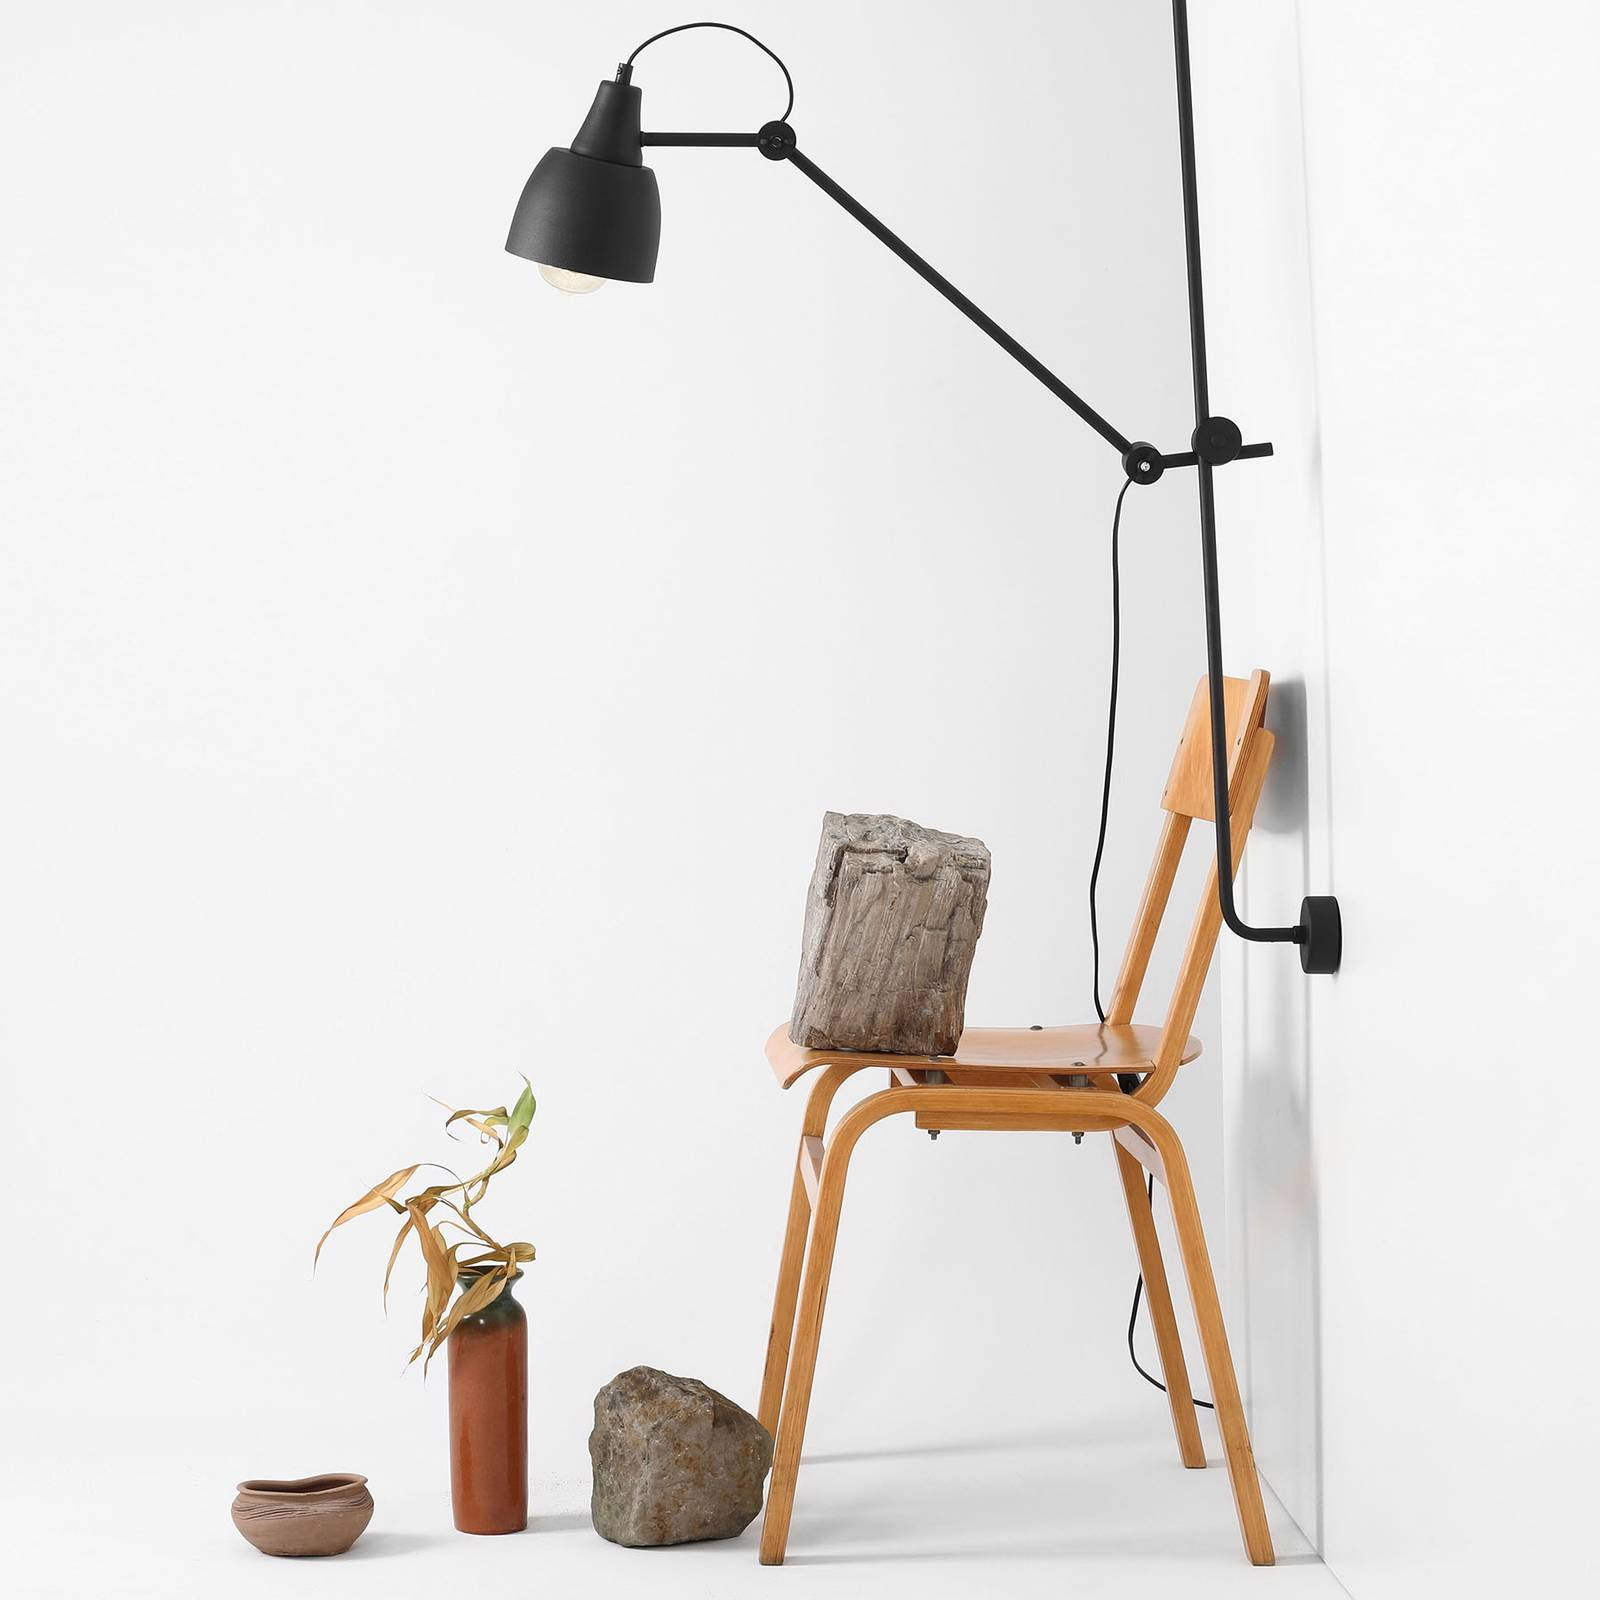 Wandlamp 997 met stekker, 1-lamp, zwart